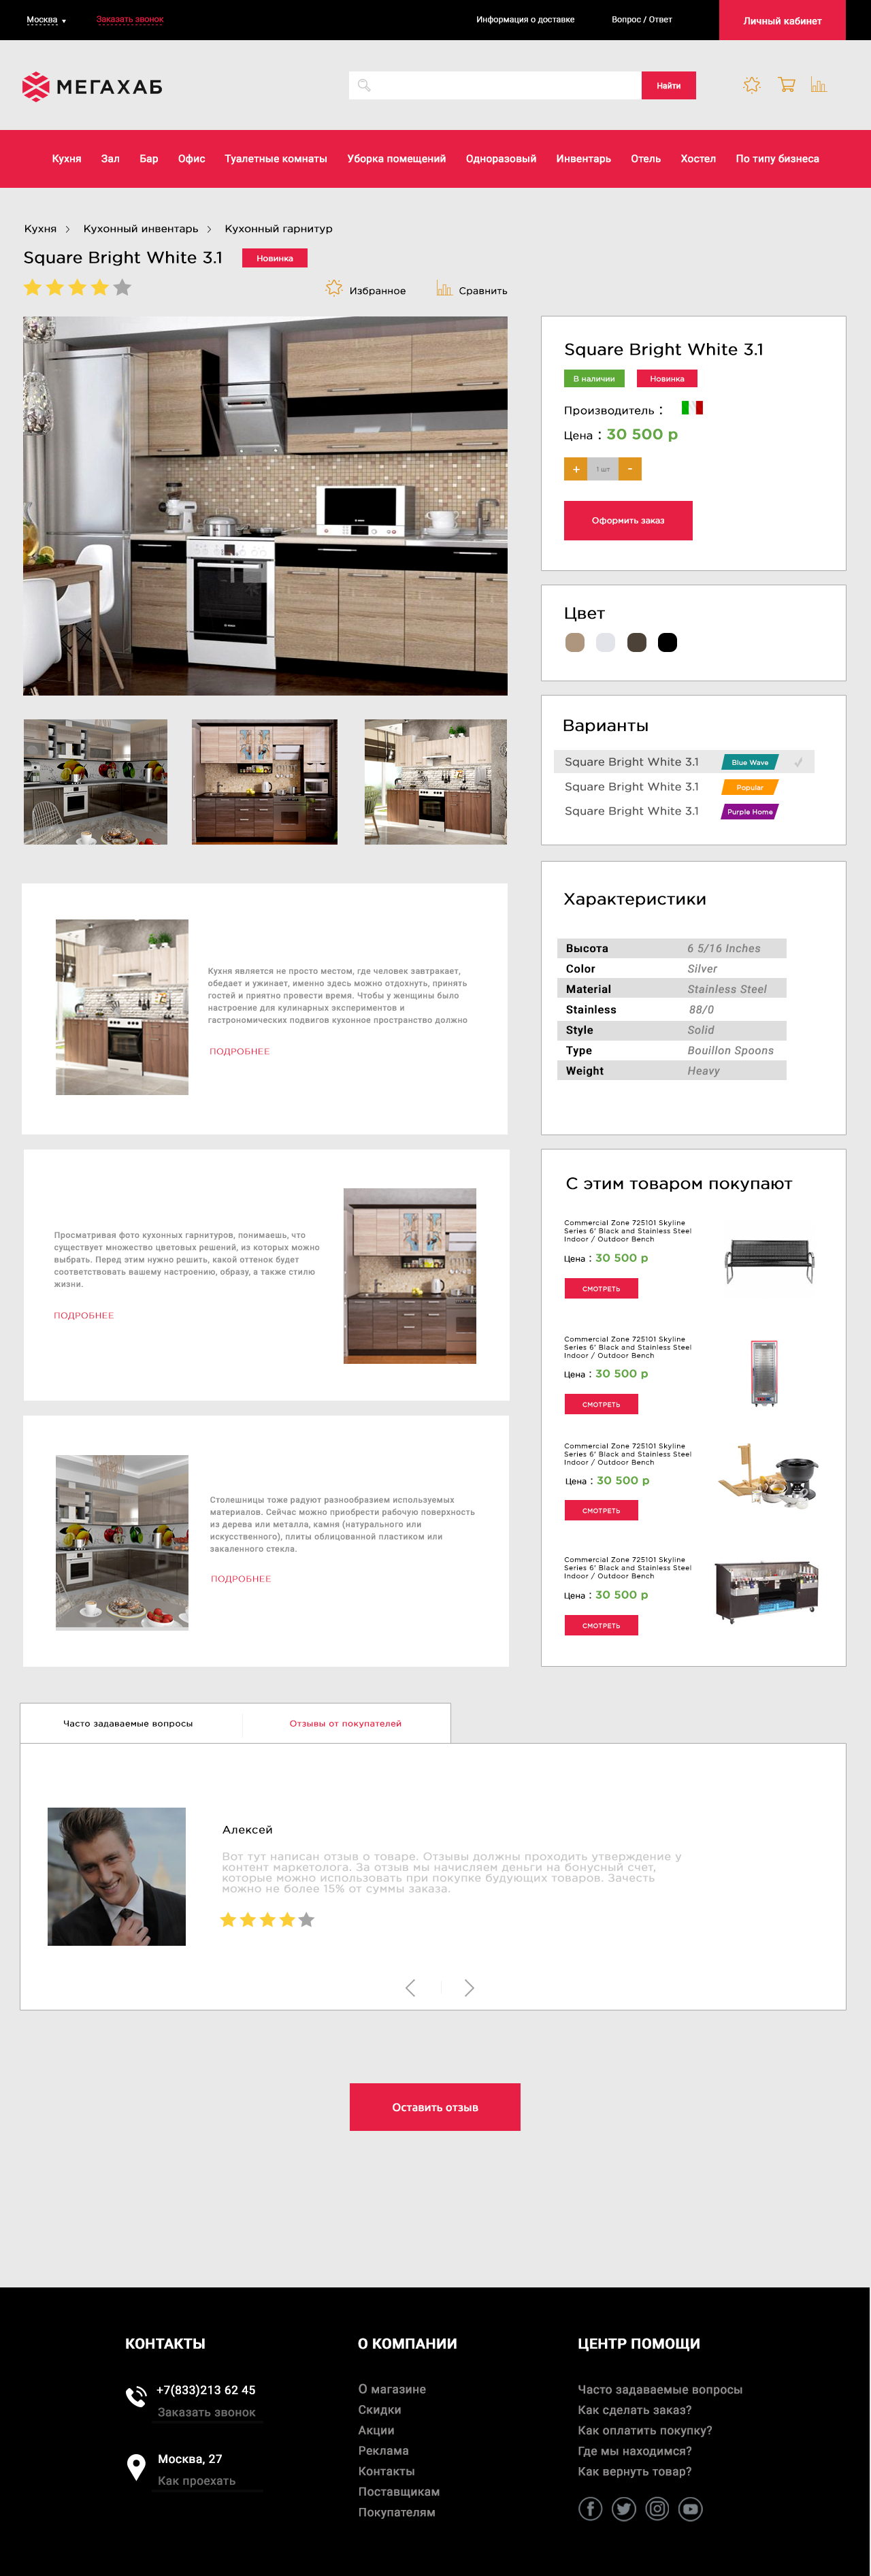 "[ конкурс ] дизайн страницы ""карточка товара"" фото f_0615babb806d5e20.png"